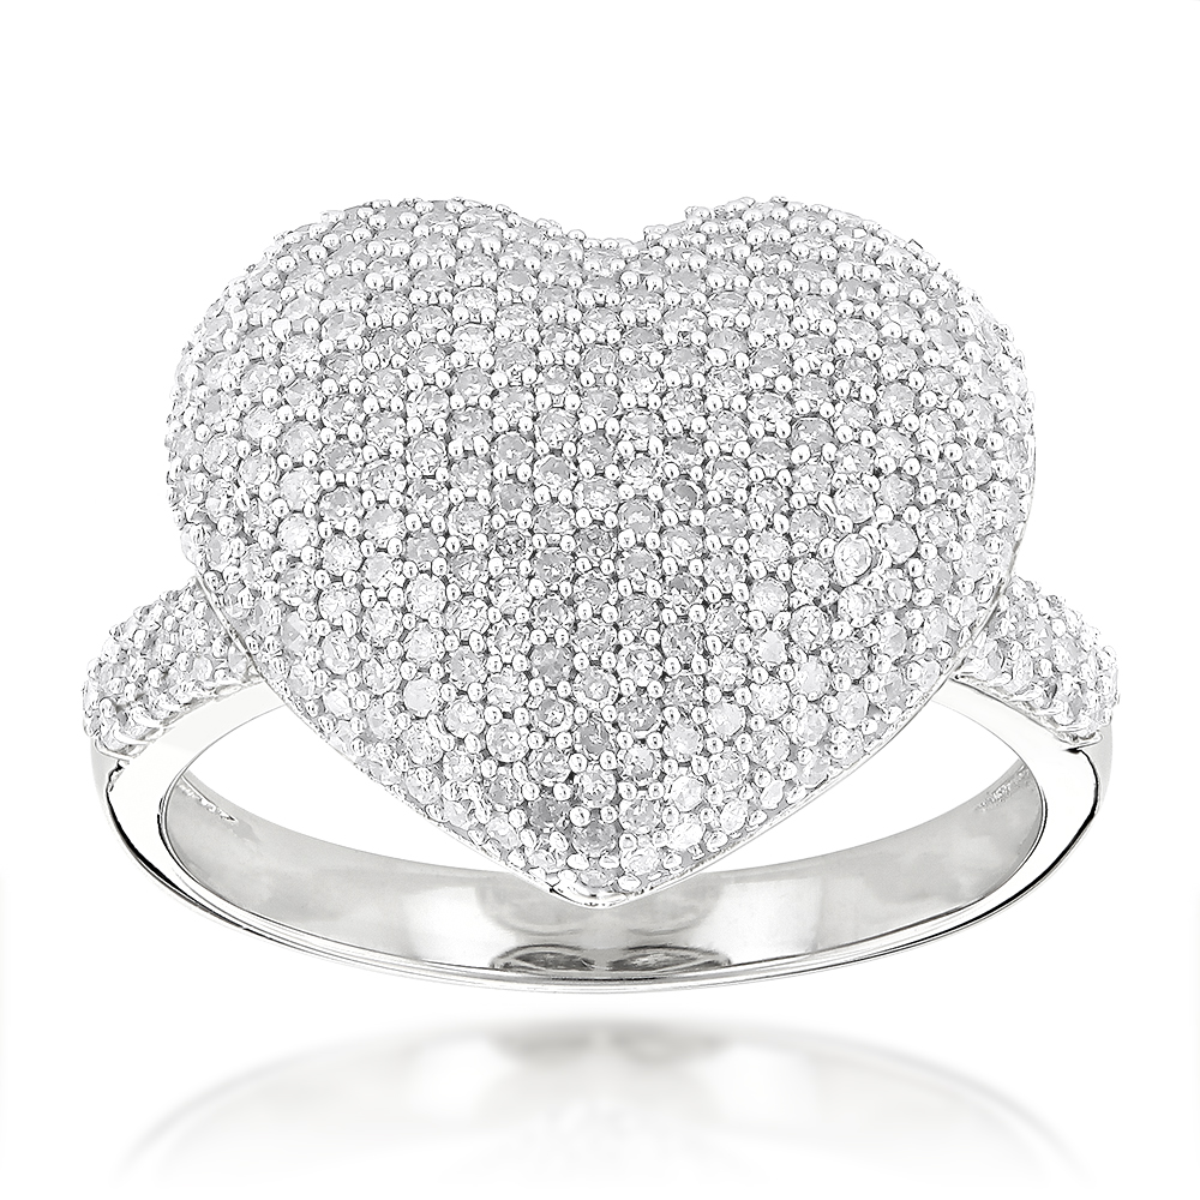 Heart Shaped Jewelry: 14K Gold Diamond Heart Ring 1.15ct